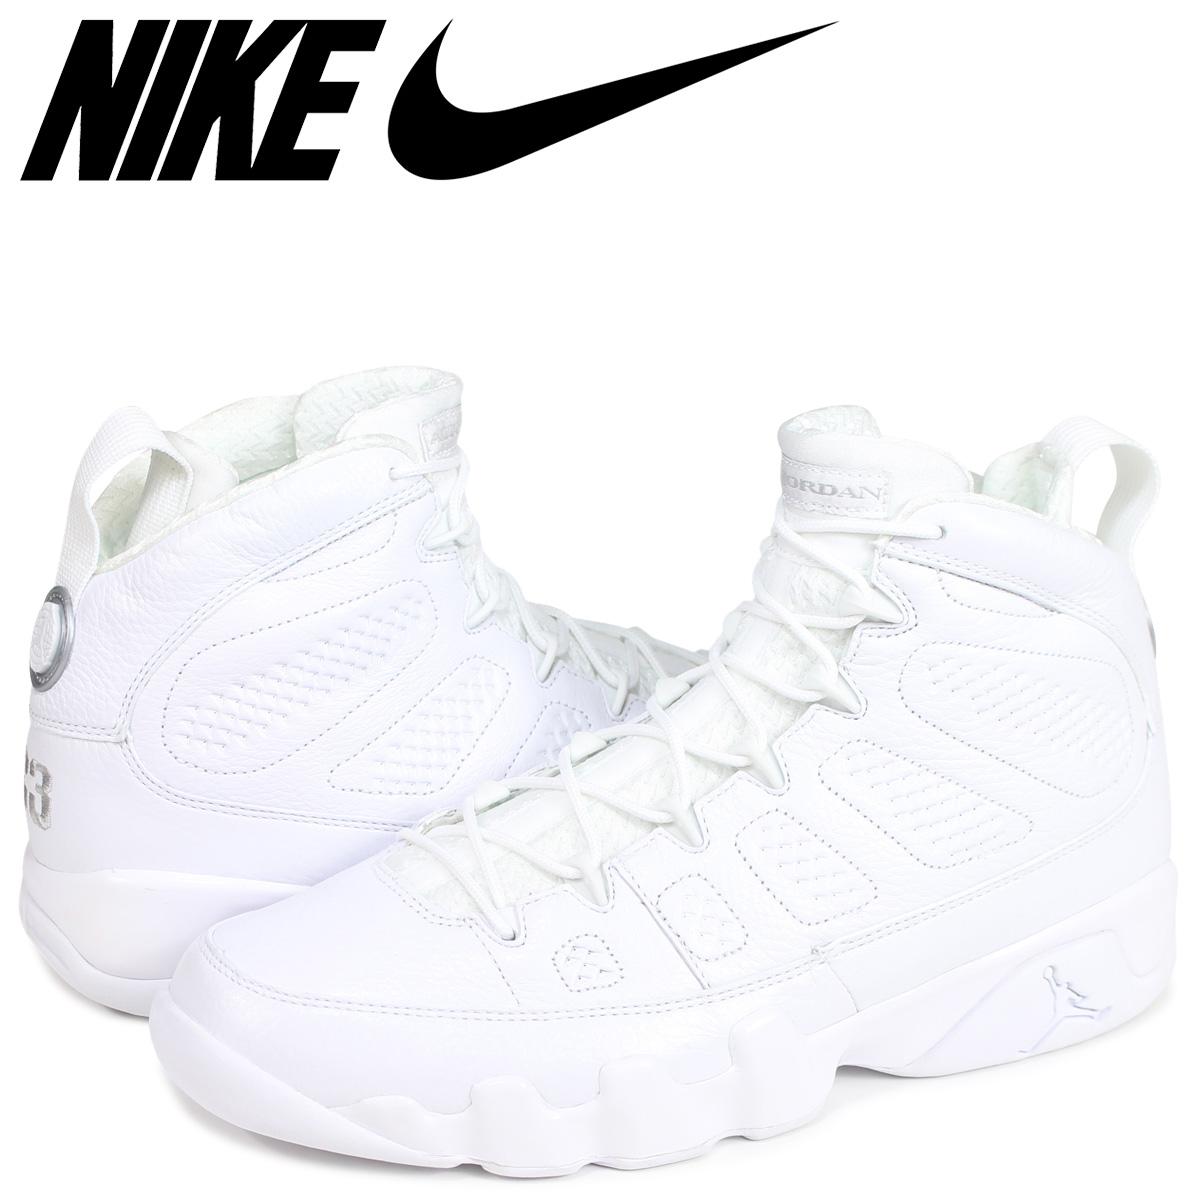 low priced 1ba9d 1b0bd NIKE Nike Air Jordan 9 nostalgic sneakers men AIR JORDAN 9 RETRO  302,370-104 white white